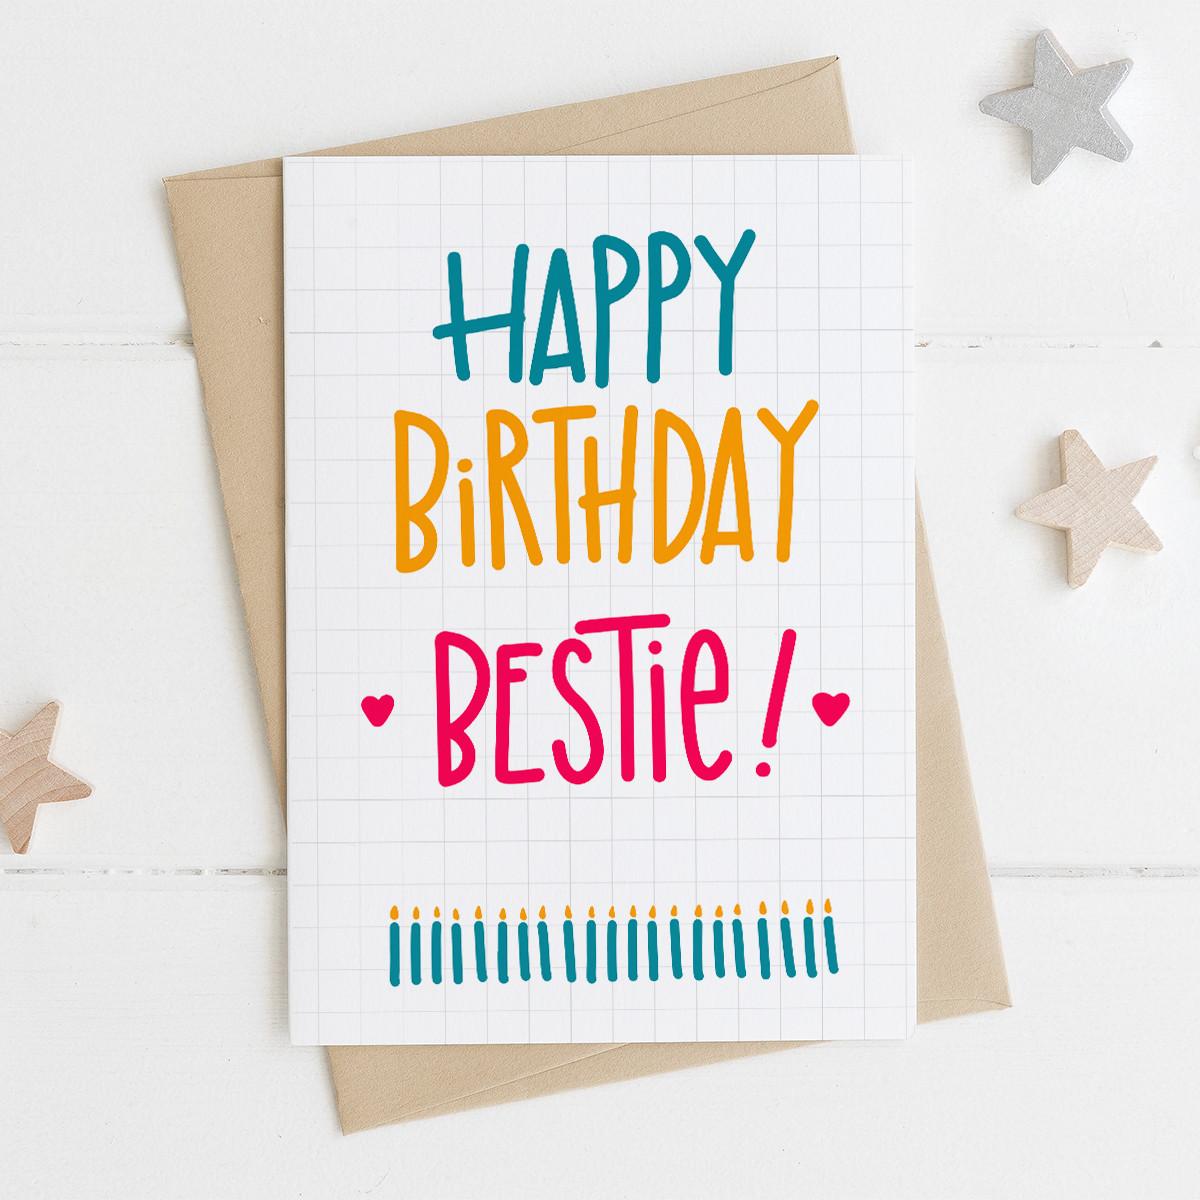 happy birthday bestie card